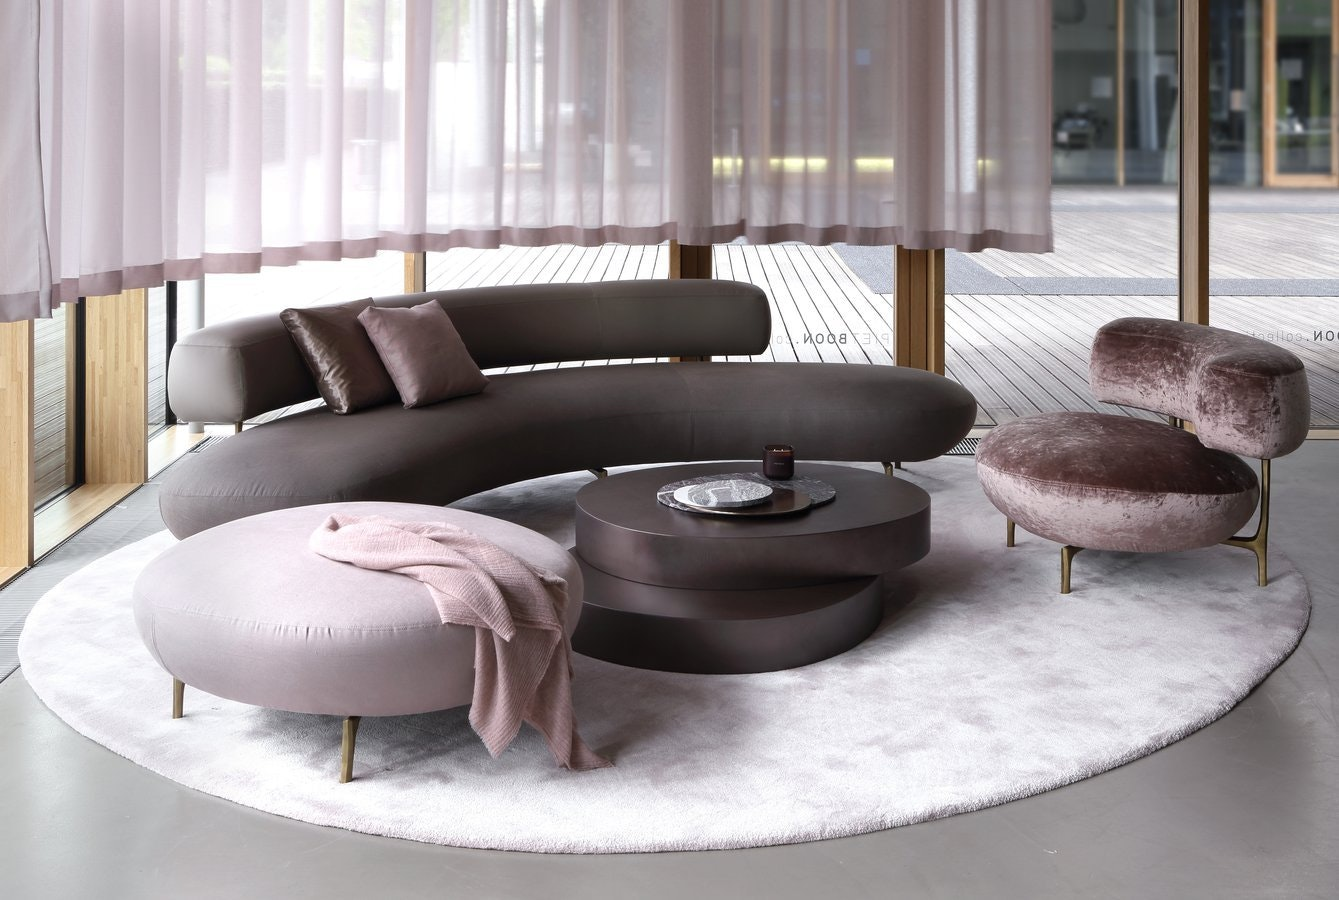 Pb Milan Furniture Fair 2017 Ec 009 Lty M0S F Jpg 0X900 Q85 Upscale